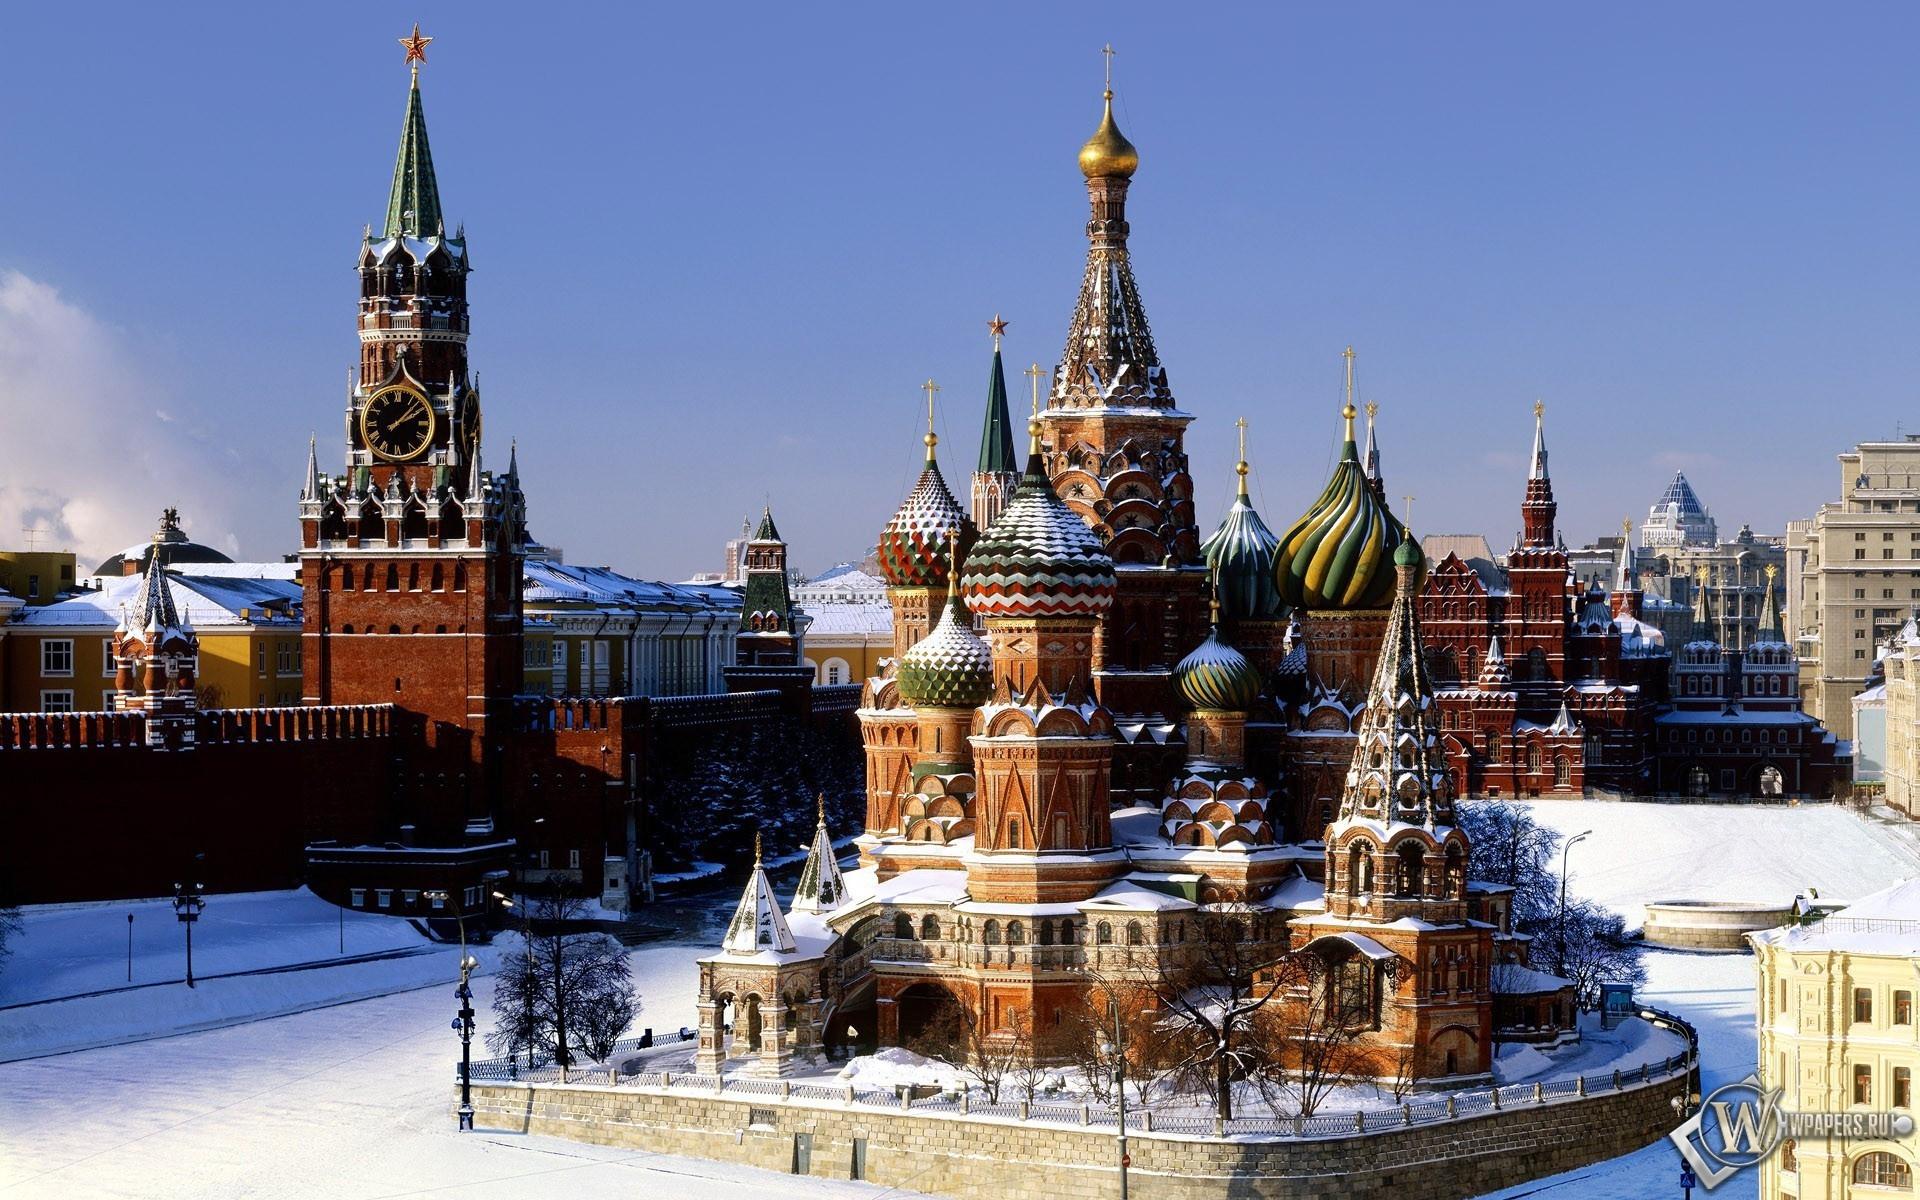 Храм Василия Блаженного (Москва) 1920x1200